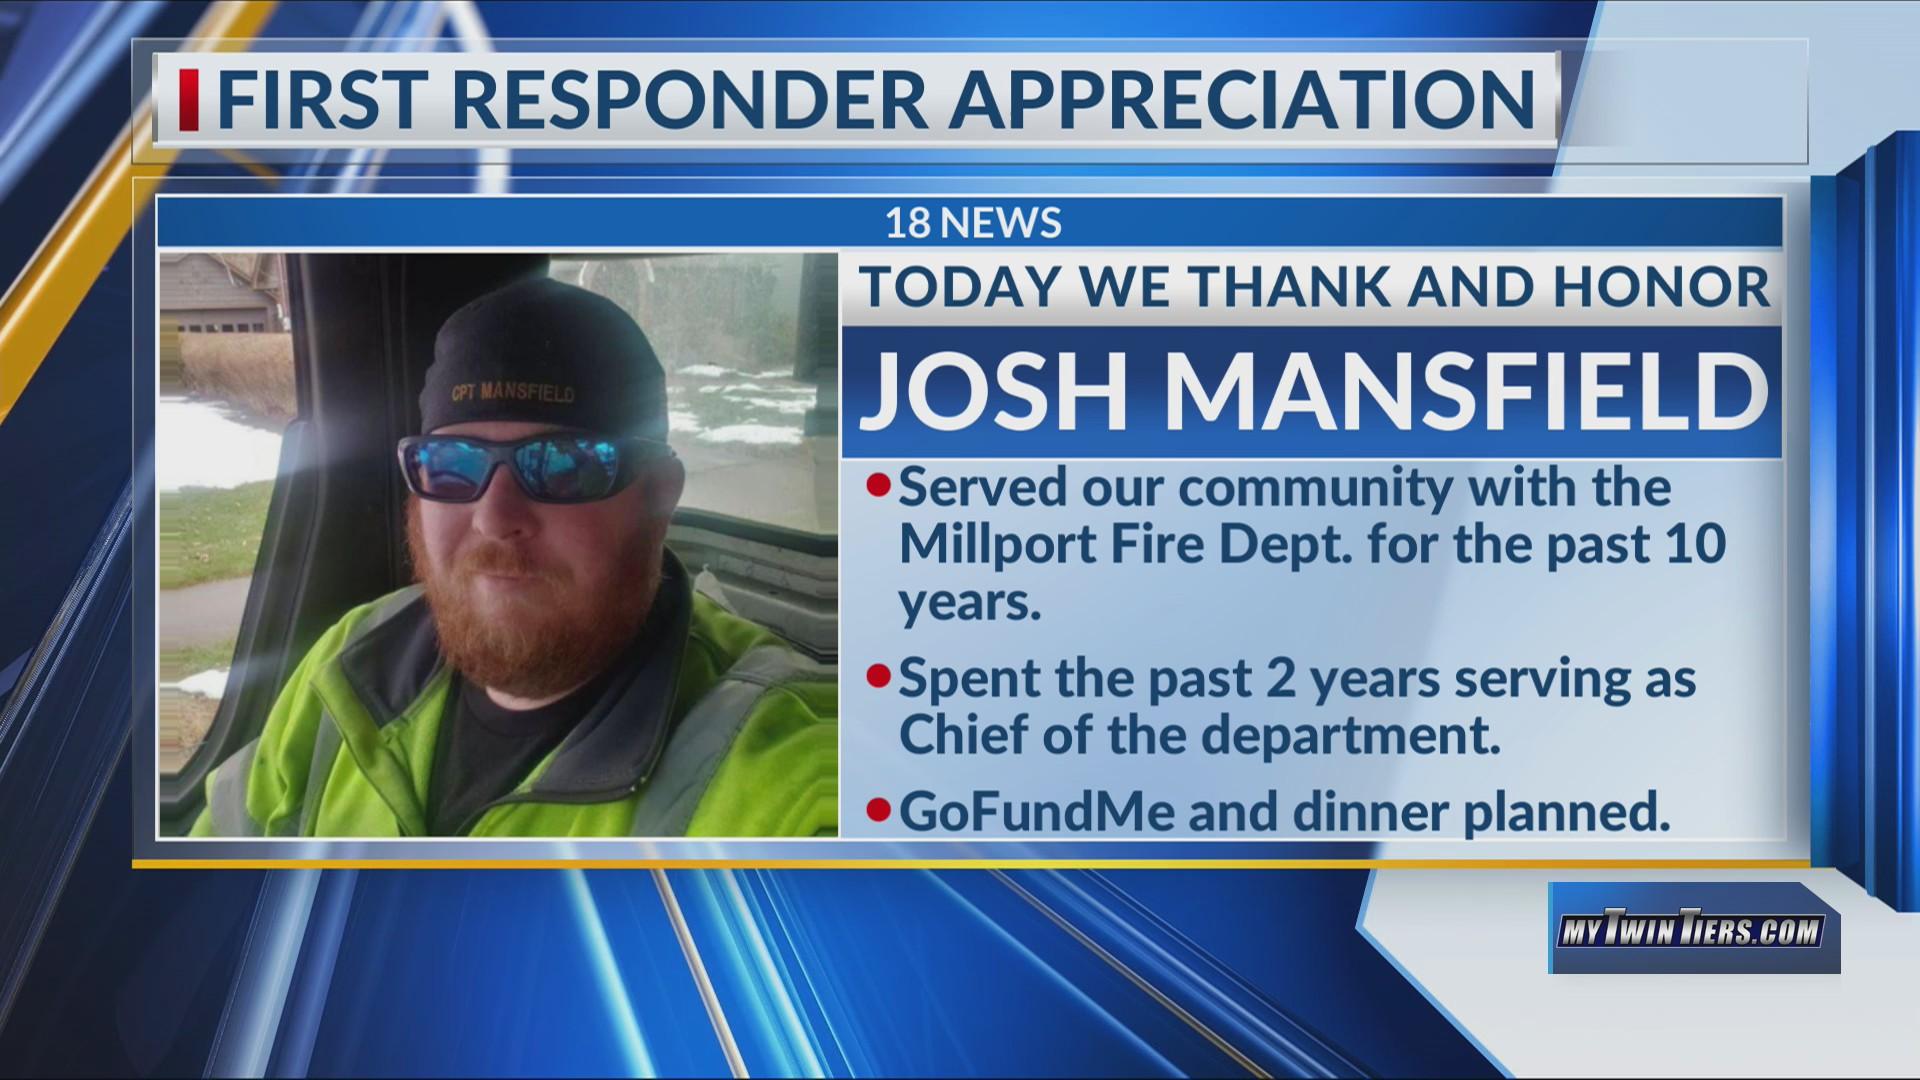 First Responder Appreciation: Josh Mansfield, Millport Fire Department